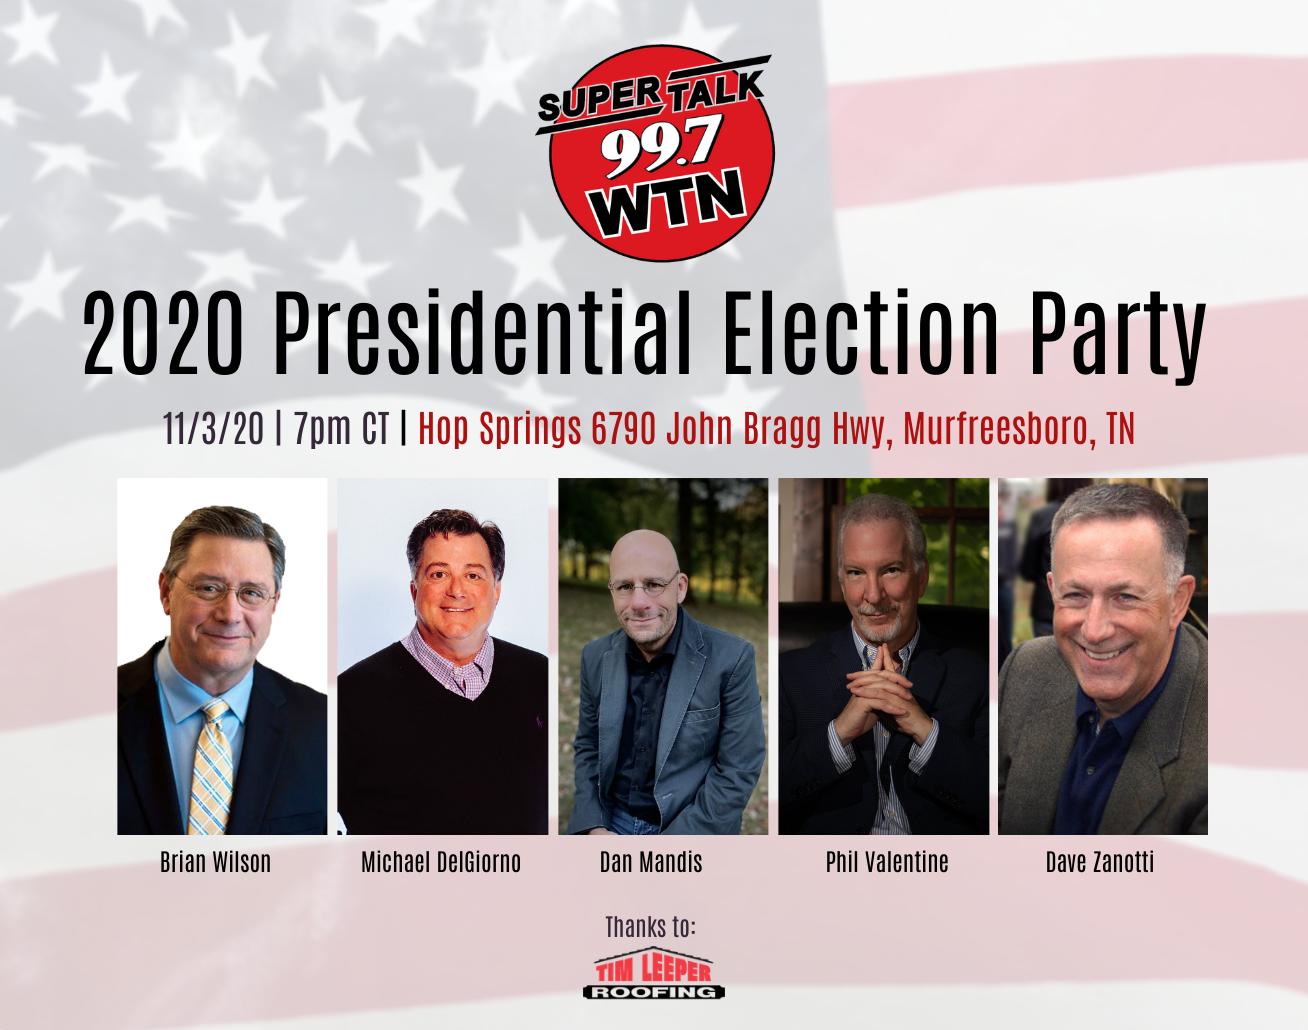 2020 Presidential Debate & Election Coverage